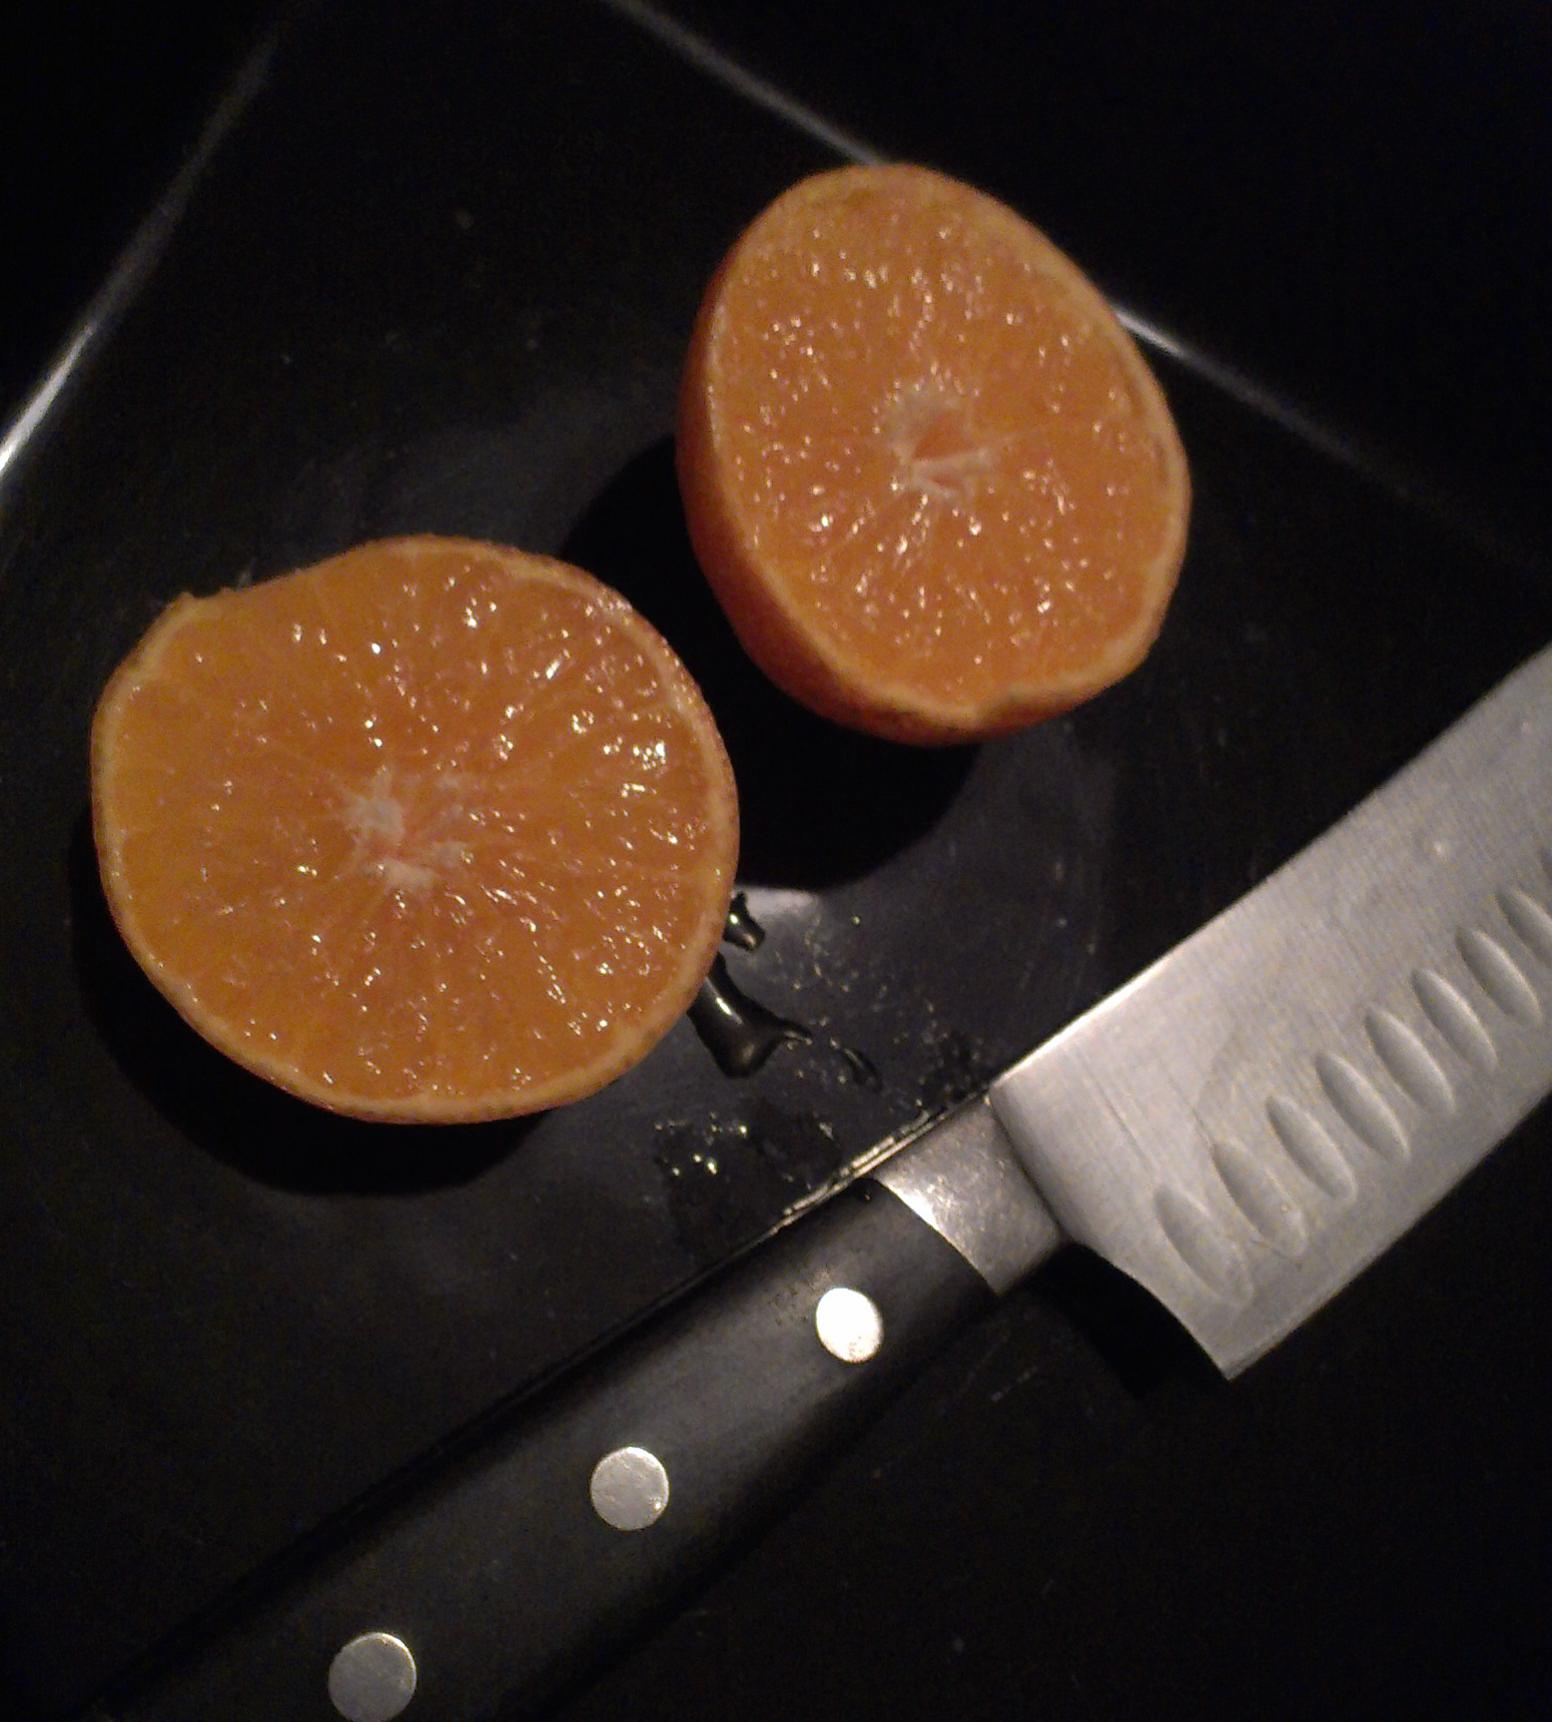 celemtine knife